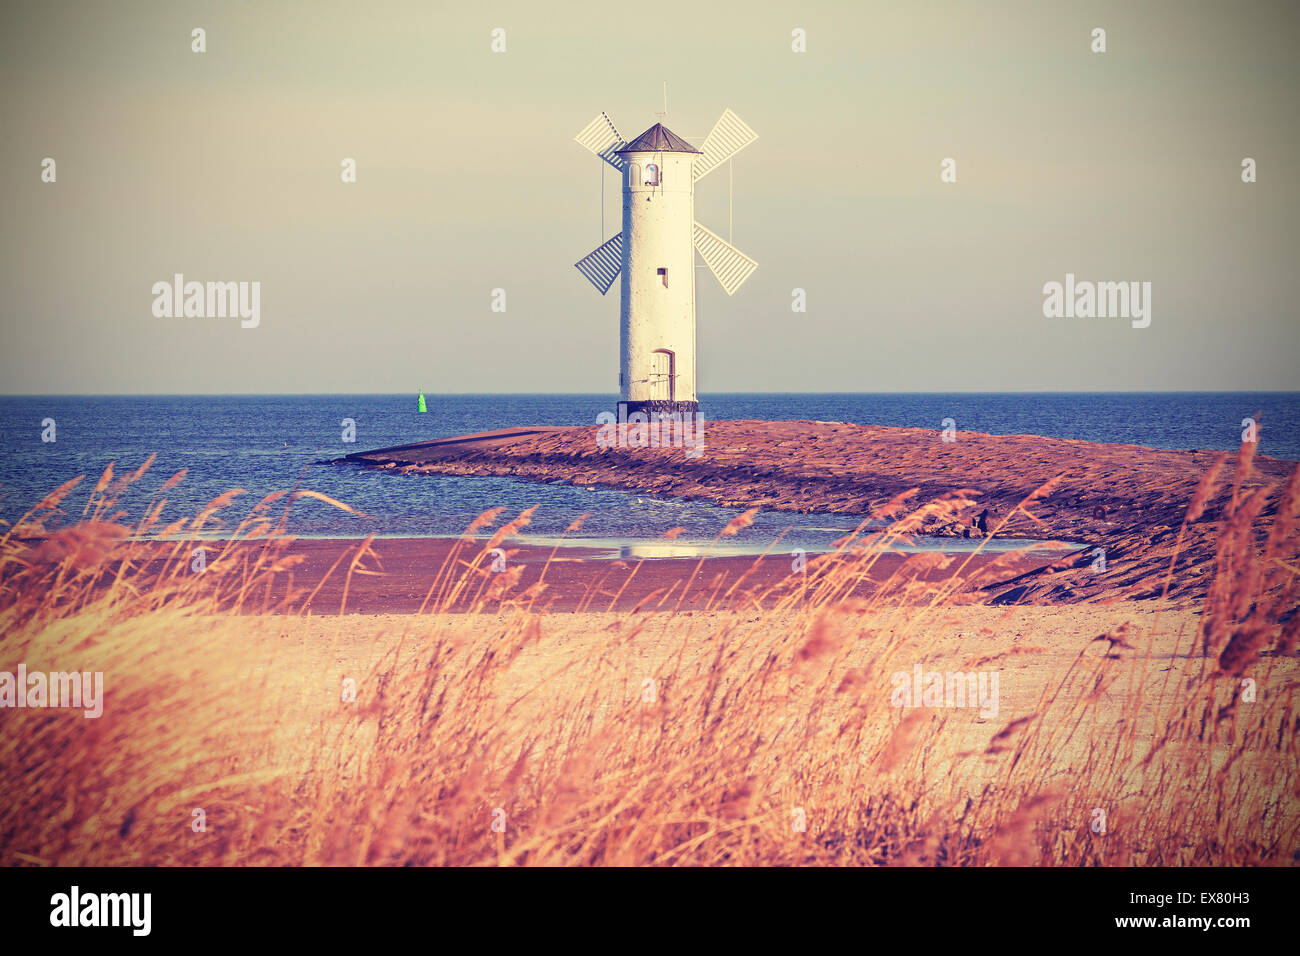 Retro vintage stylized lighthouse, Swinoujscie in Poland. - Stock Image